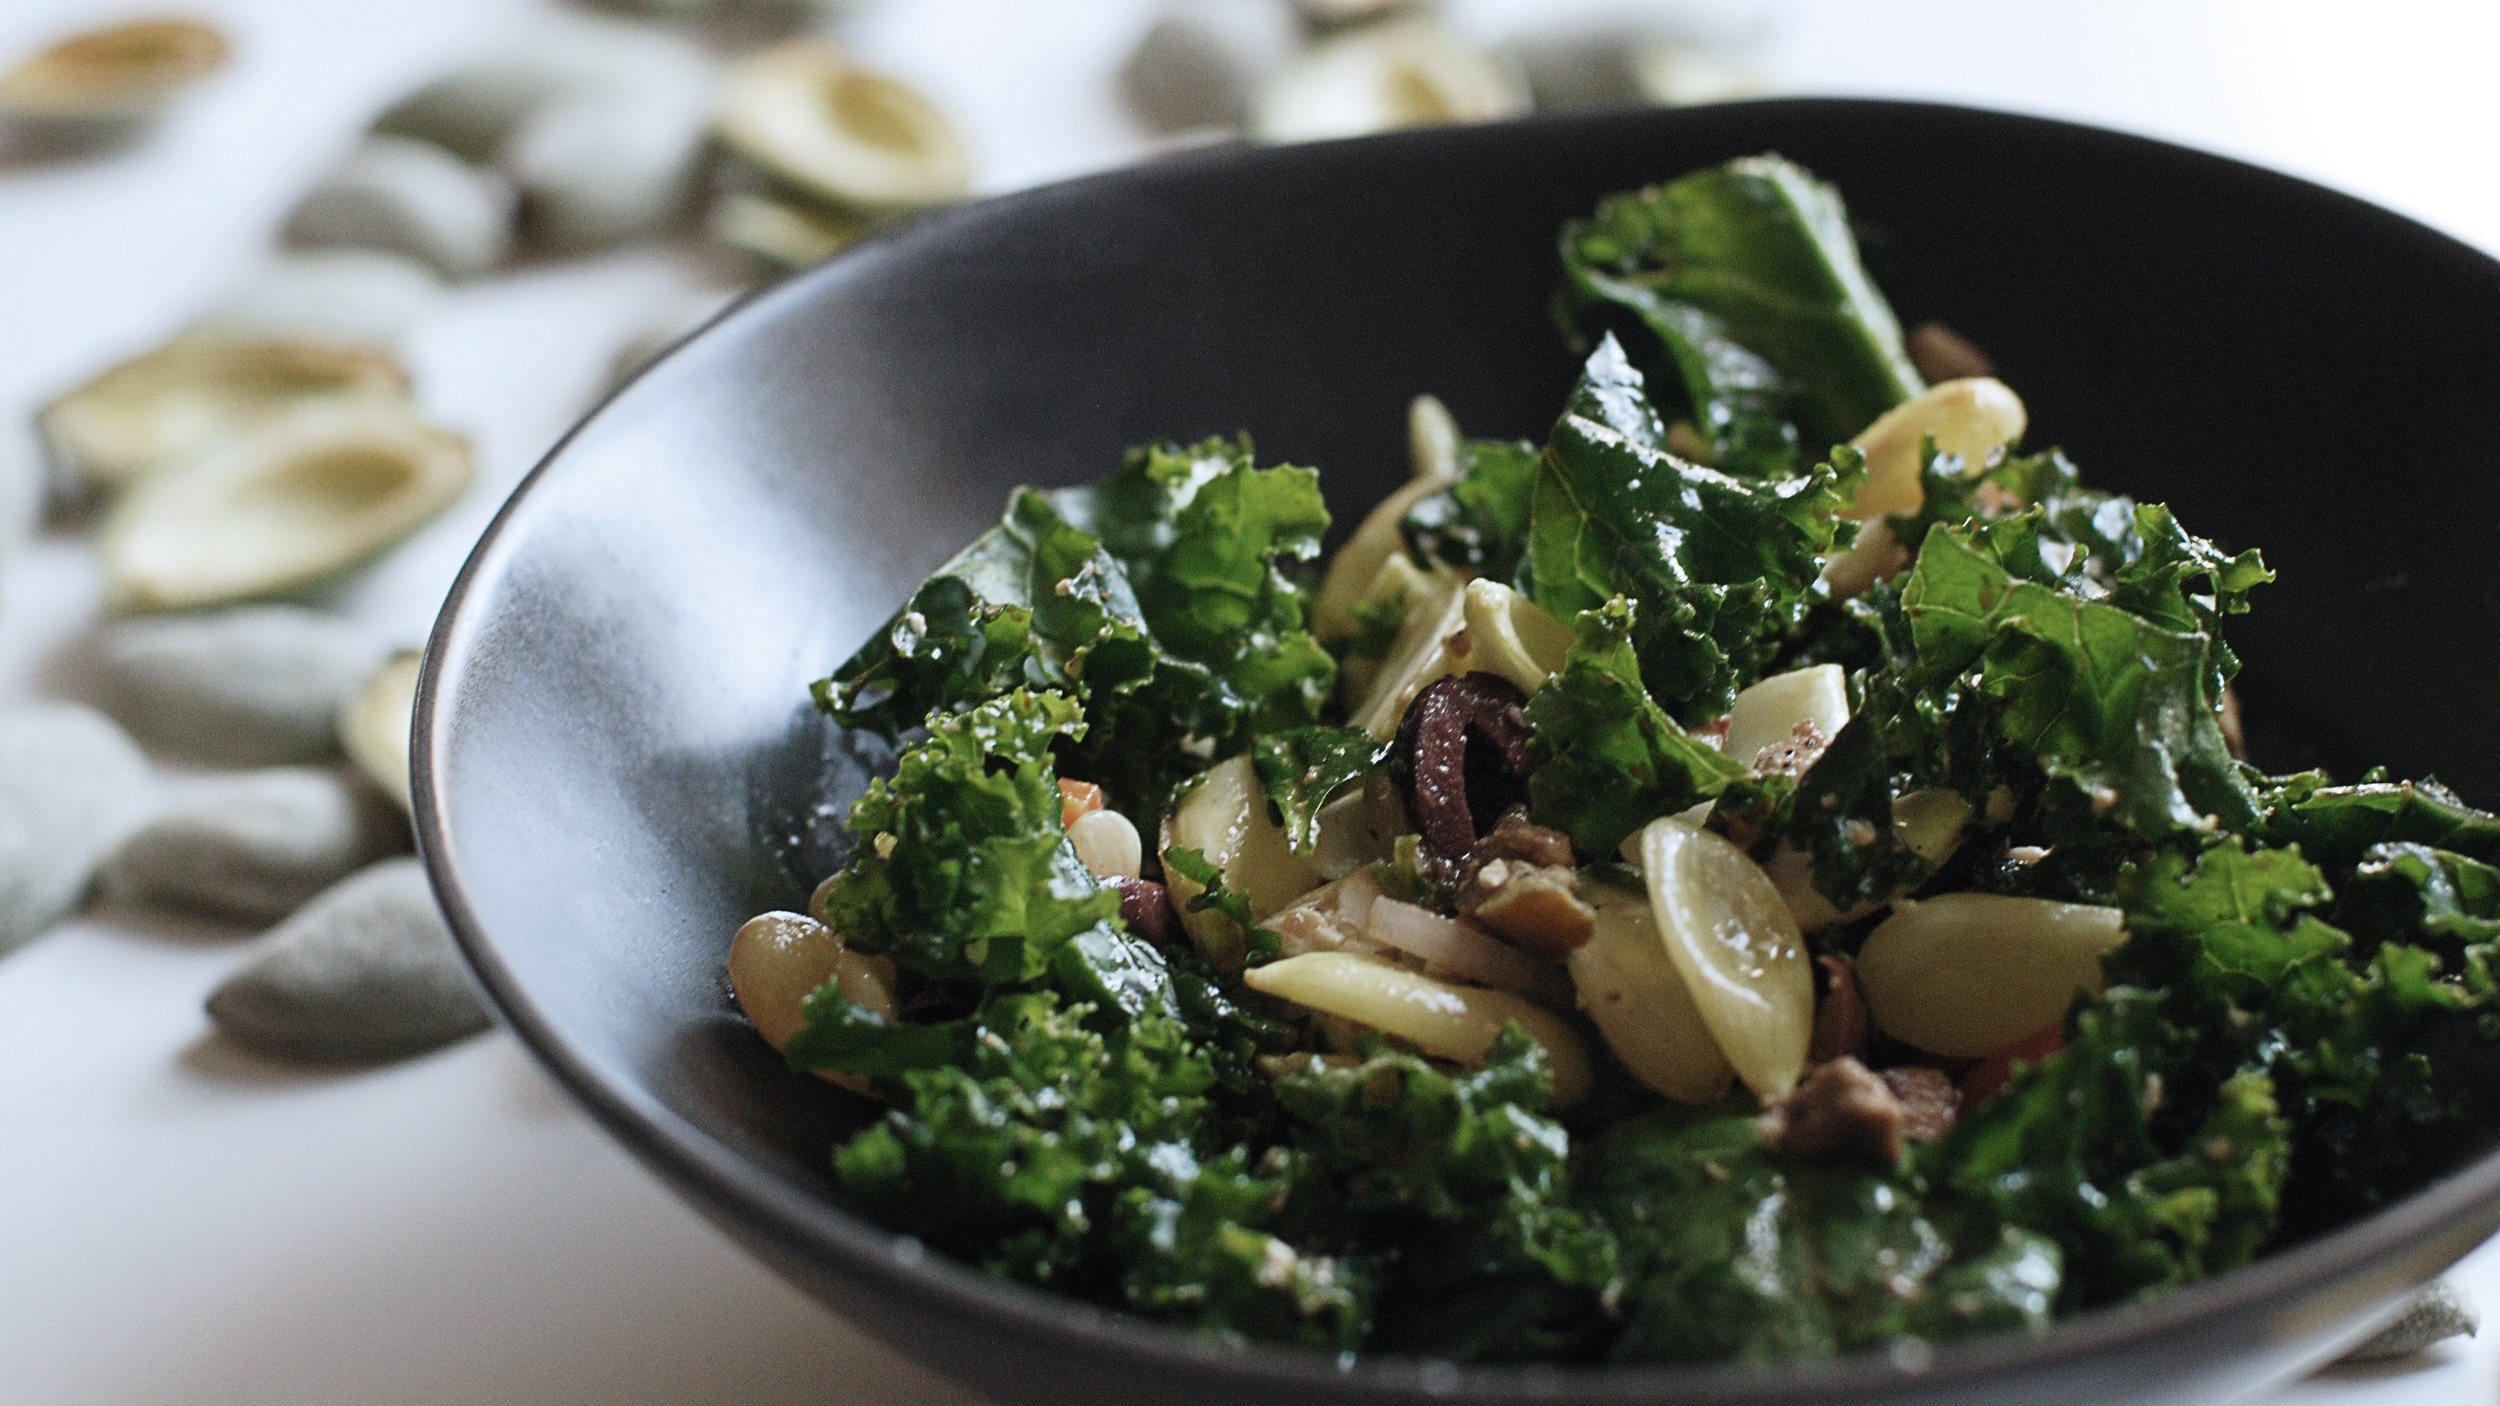 Green Almond Salad